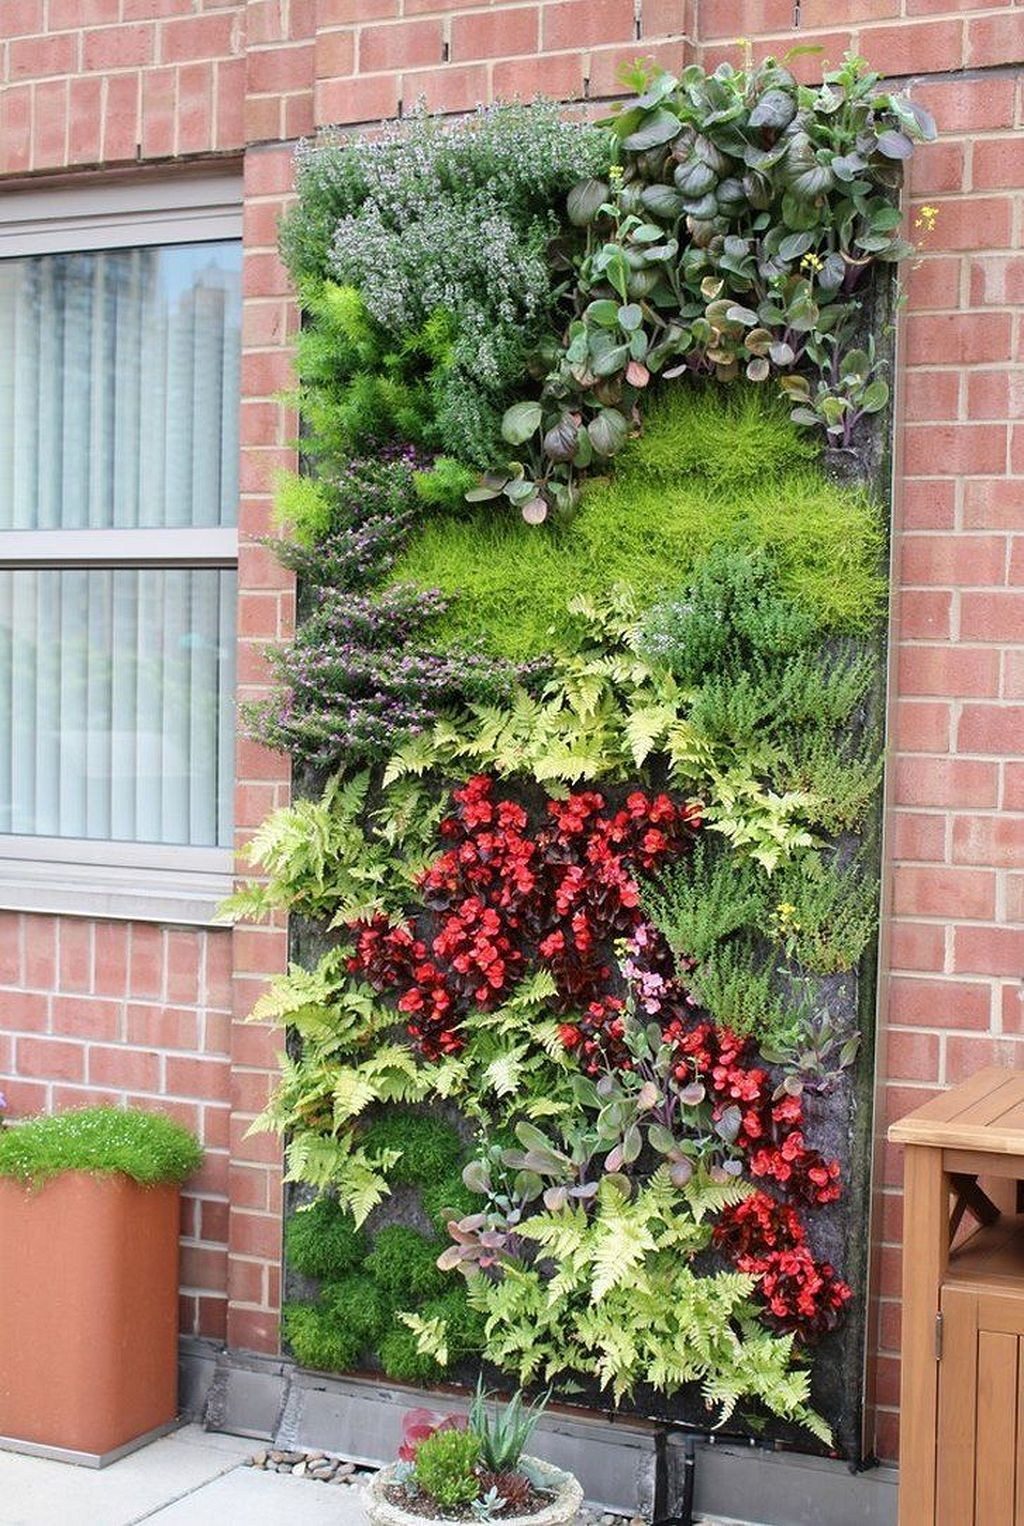 gorgeous 30+ vertical hydroponics gardening ideas https://gardenmagz